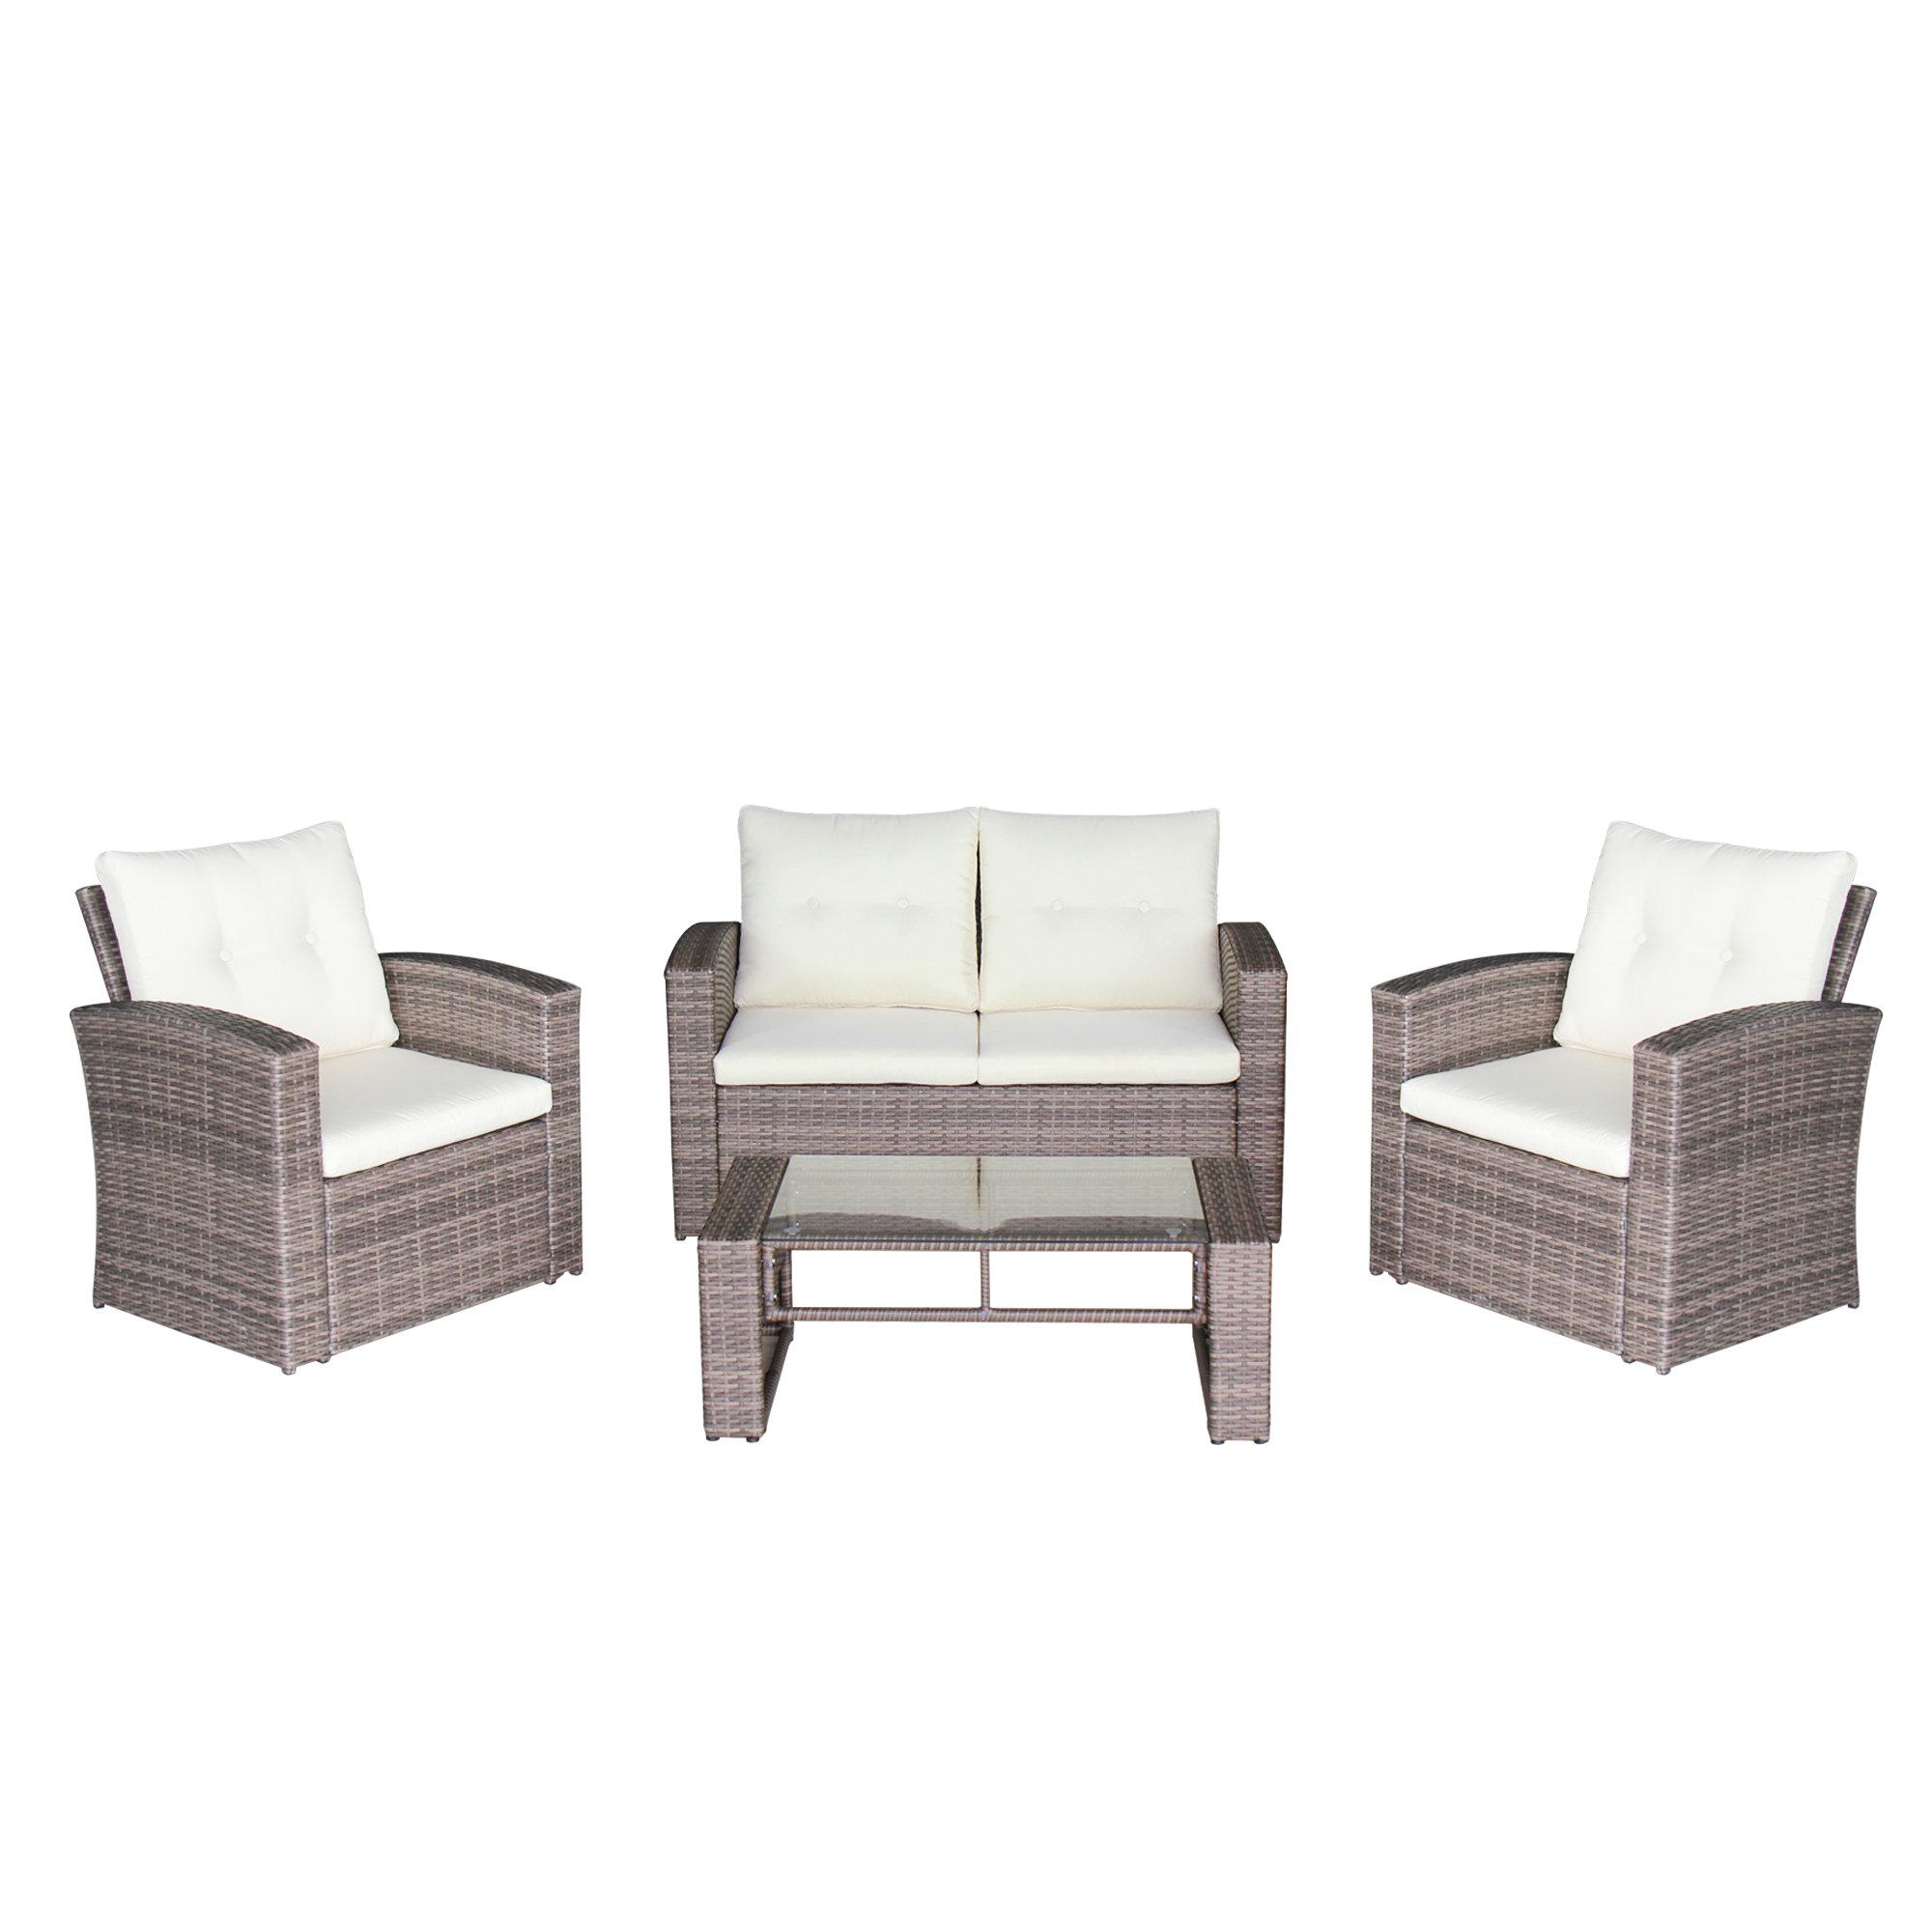 Wondrous Bremerton 4 Piece Rattan Sofa Seating Group Home Interior And Landscaping Ologienasavecom